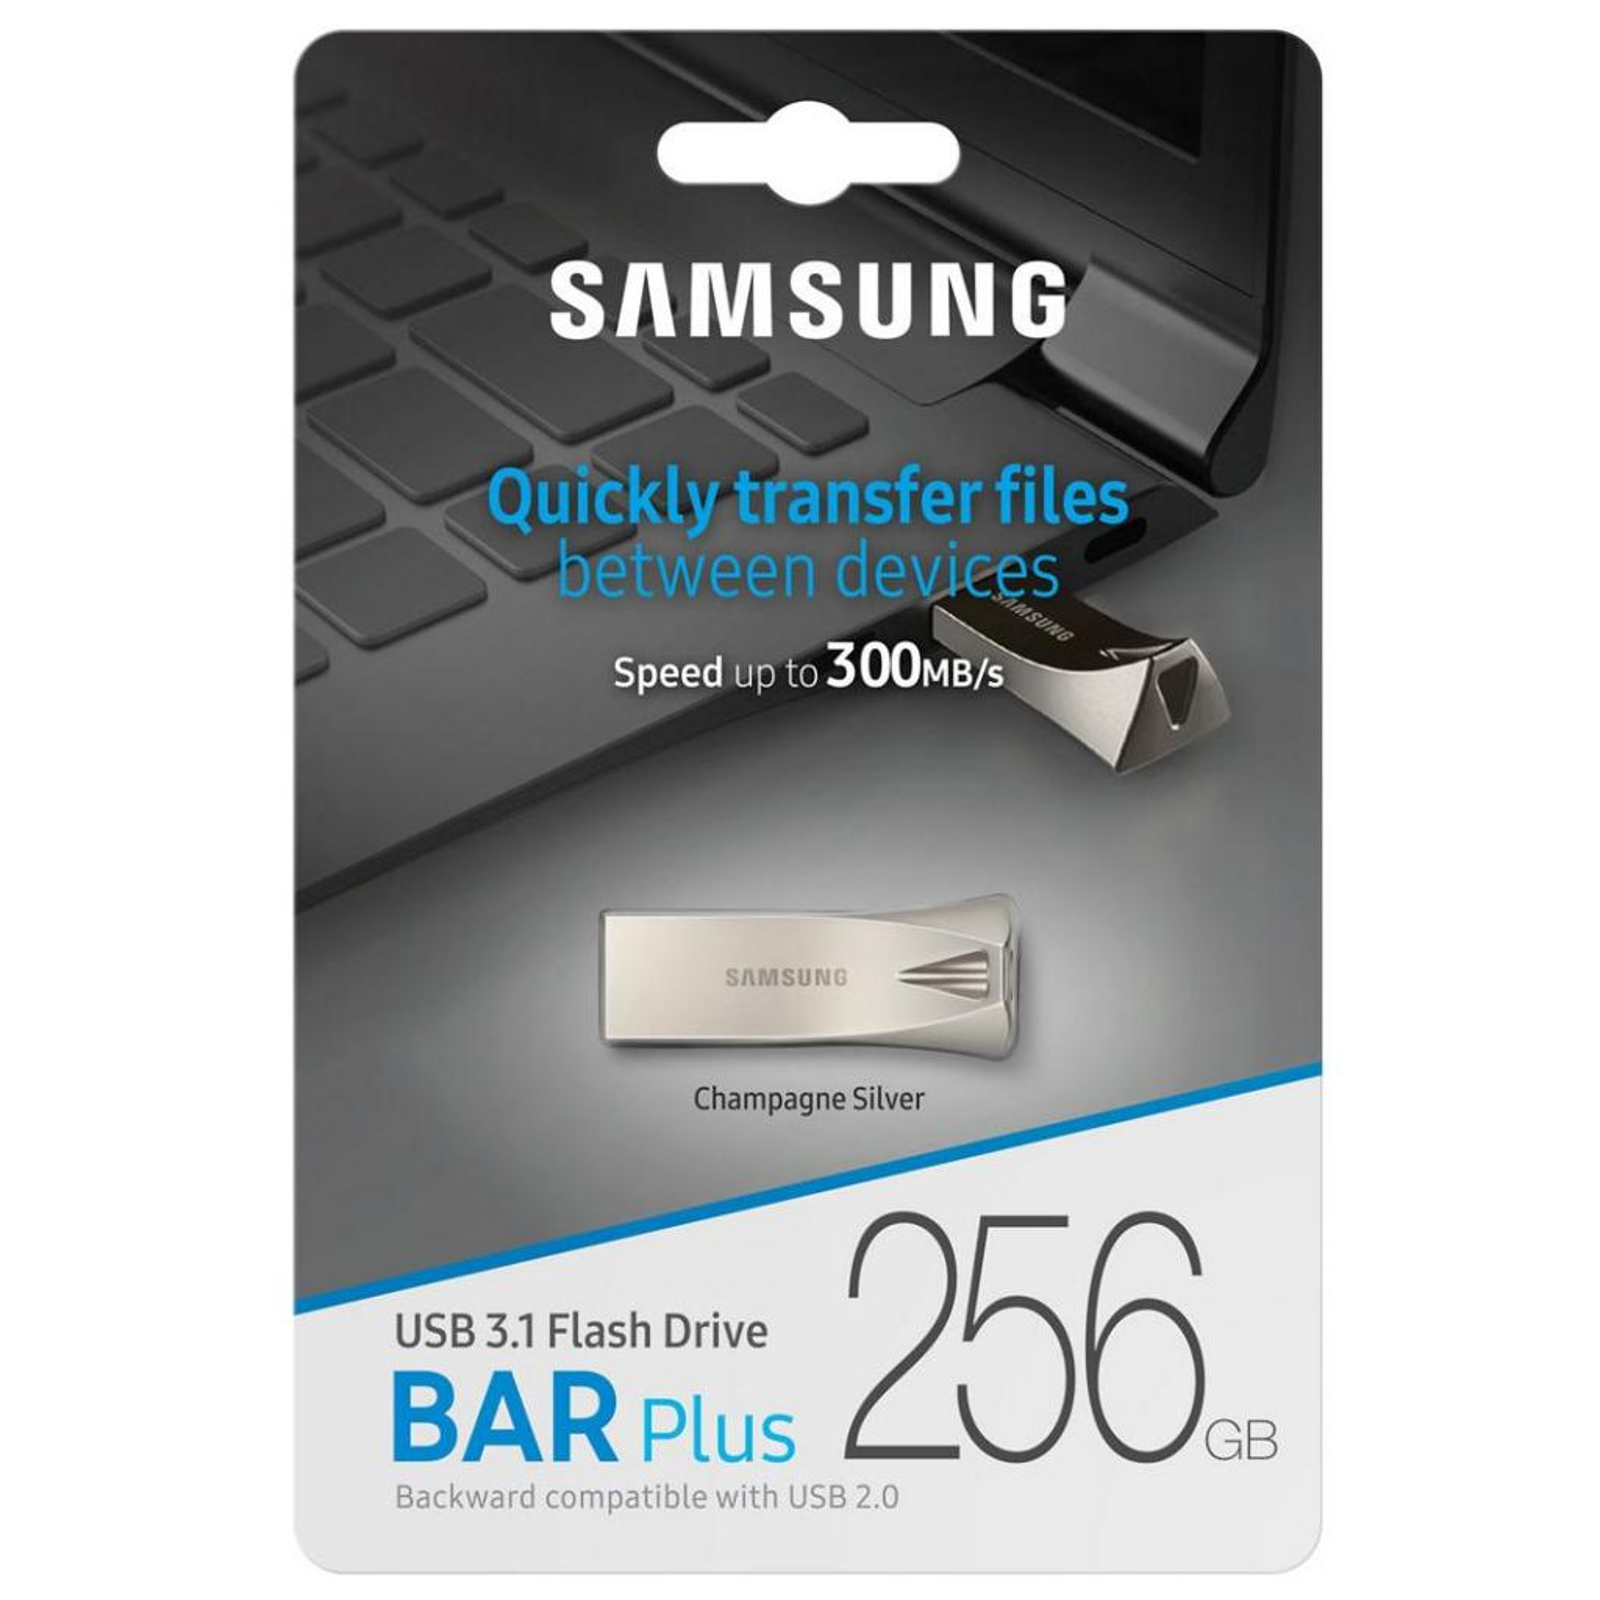 USB флеш накопитель Samsung 64GB Bar Plus Silver USB 3.1 (MUF-64BE3/APC) изображение 7